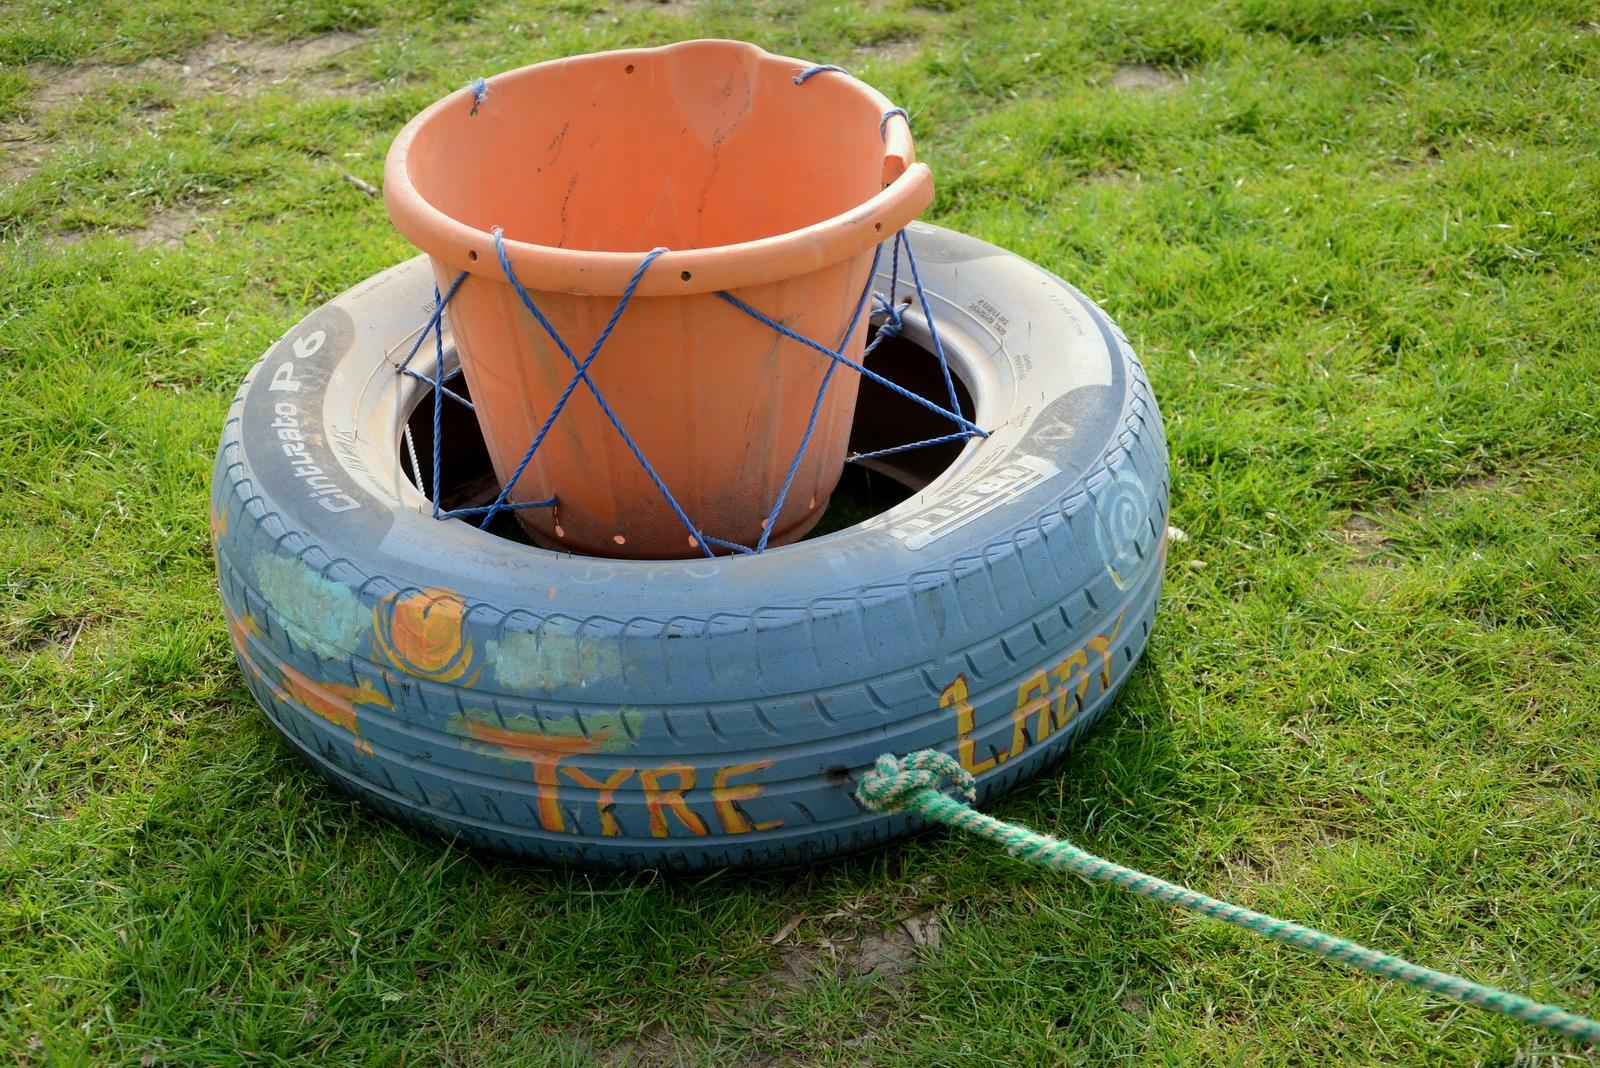 Dragging a tyre around a marathon - Informed Choice